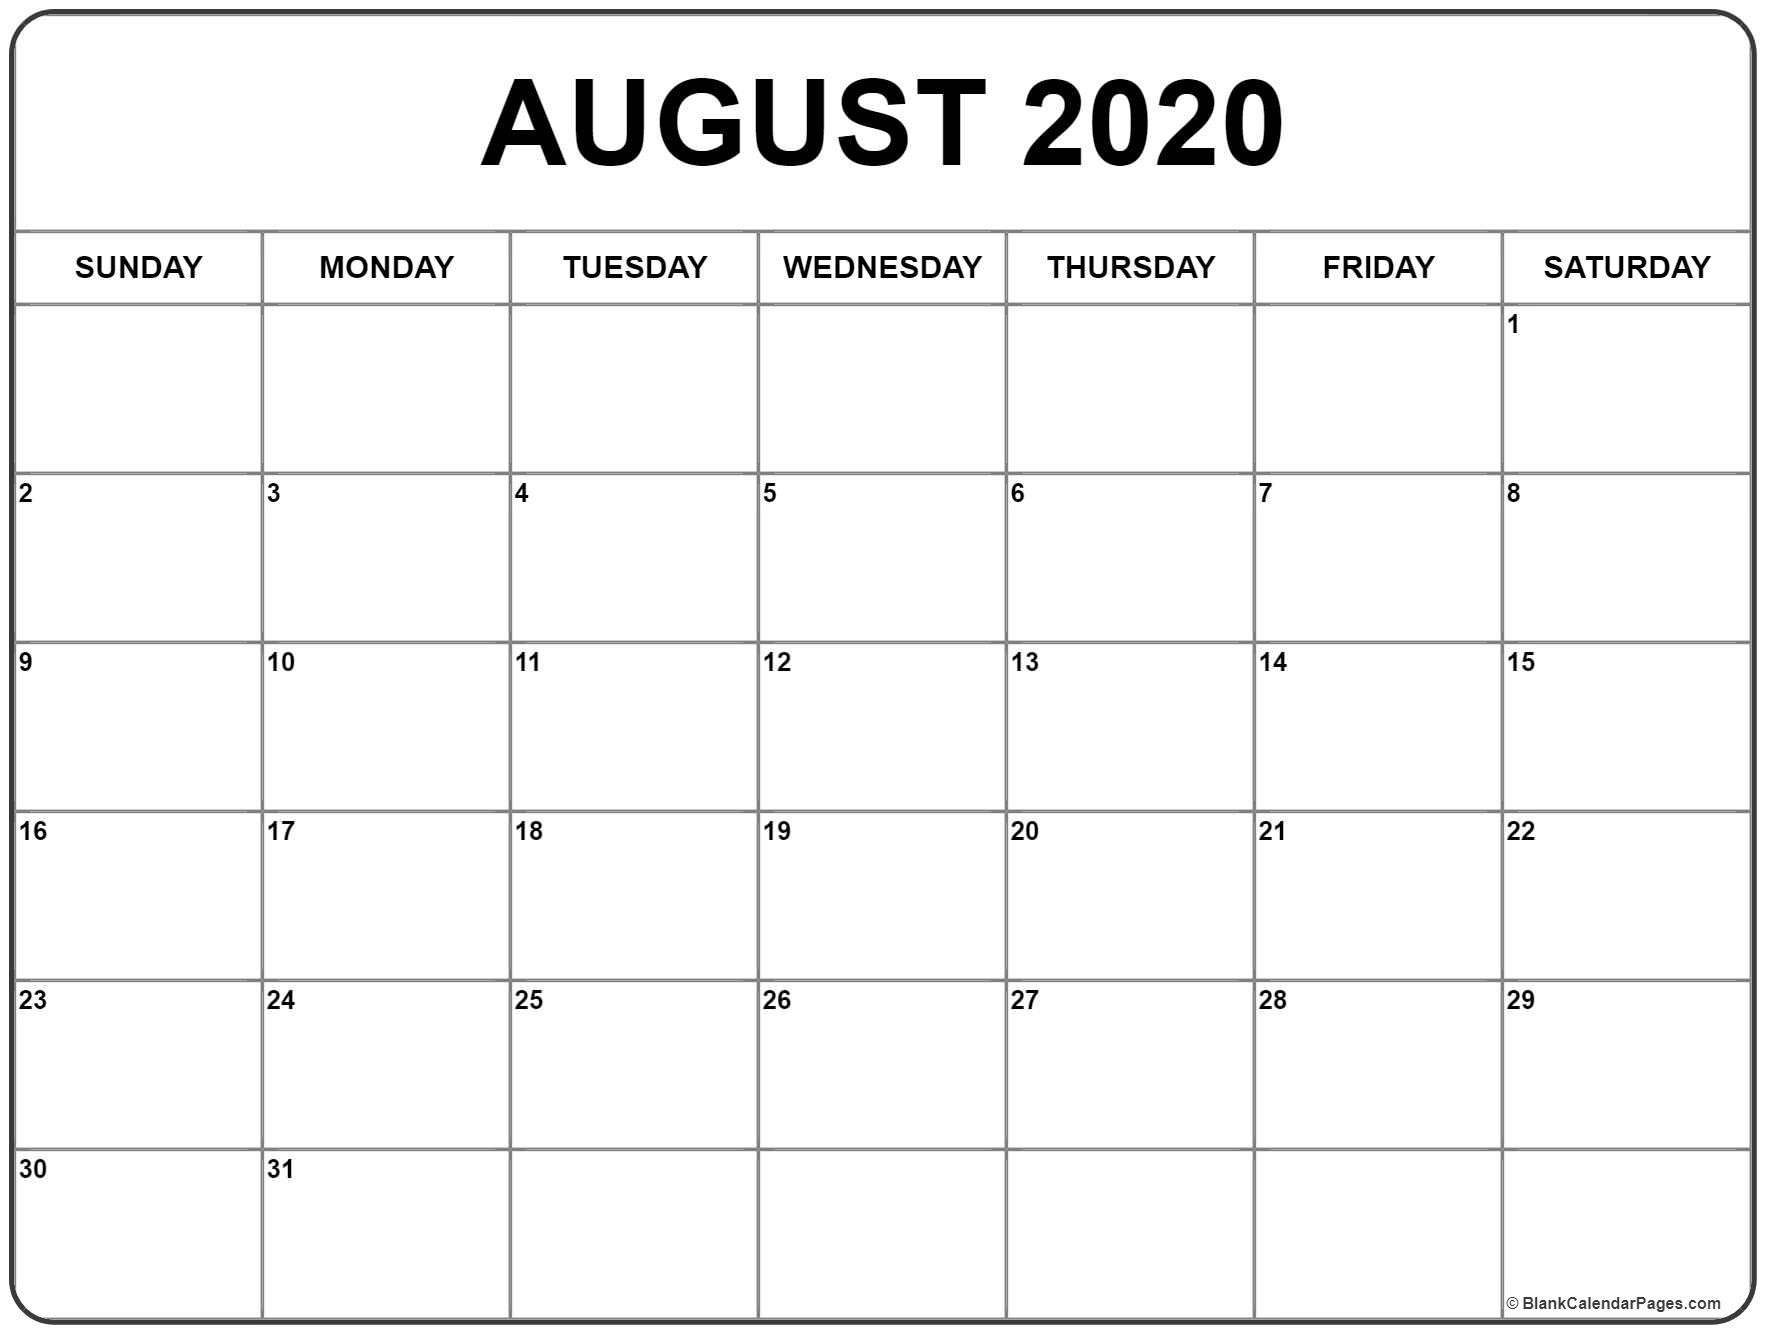 Blank August 2020 Calendar Printable | Example Calendar regarding July And August 2020 Calendar Printable